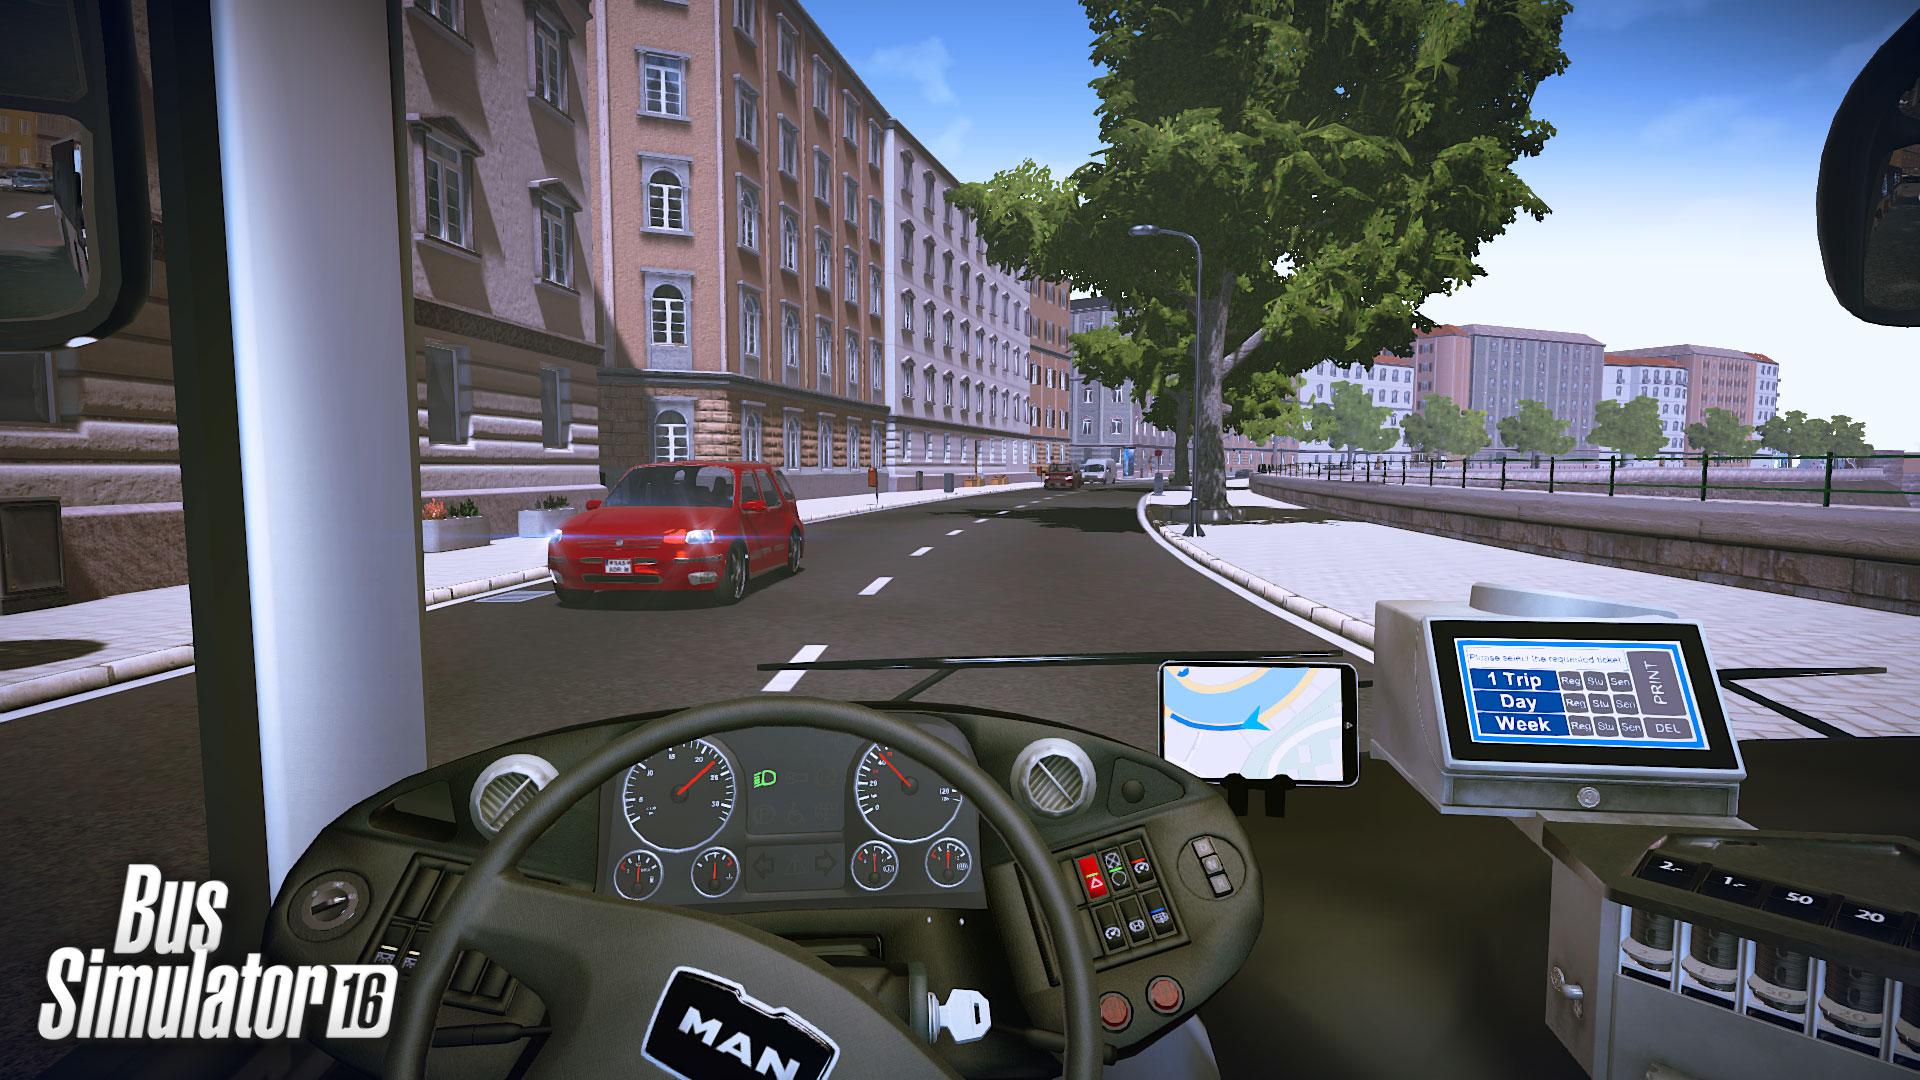 bus simulator 16 man lion s city a47 m online game code. Black Bedroom Furniture Sets. Home Design Ideas